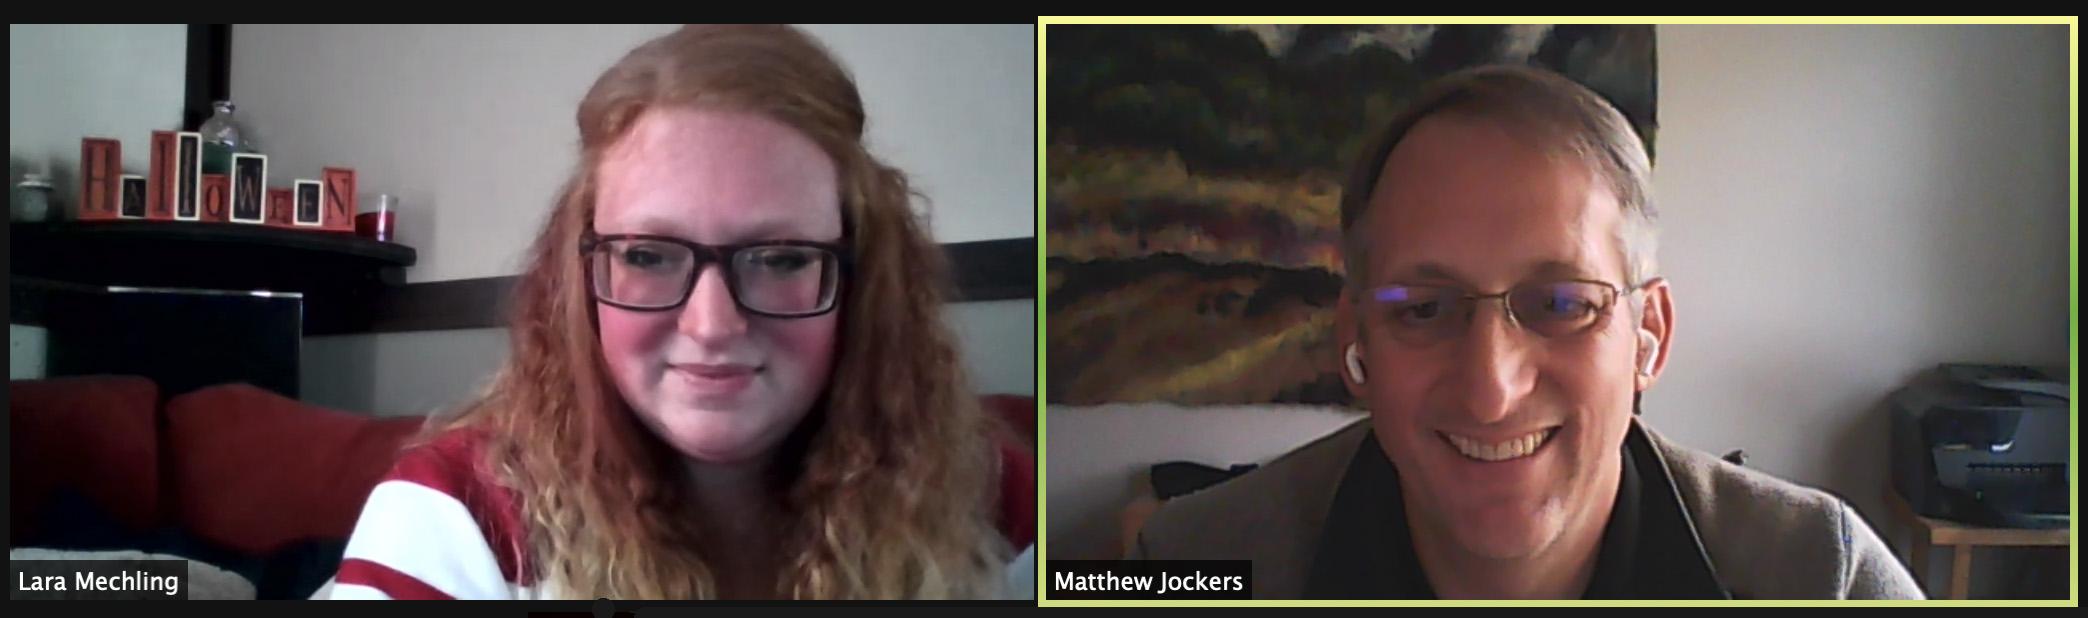 Lara Mechling and Matthew Jockers.